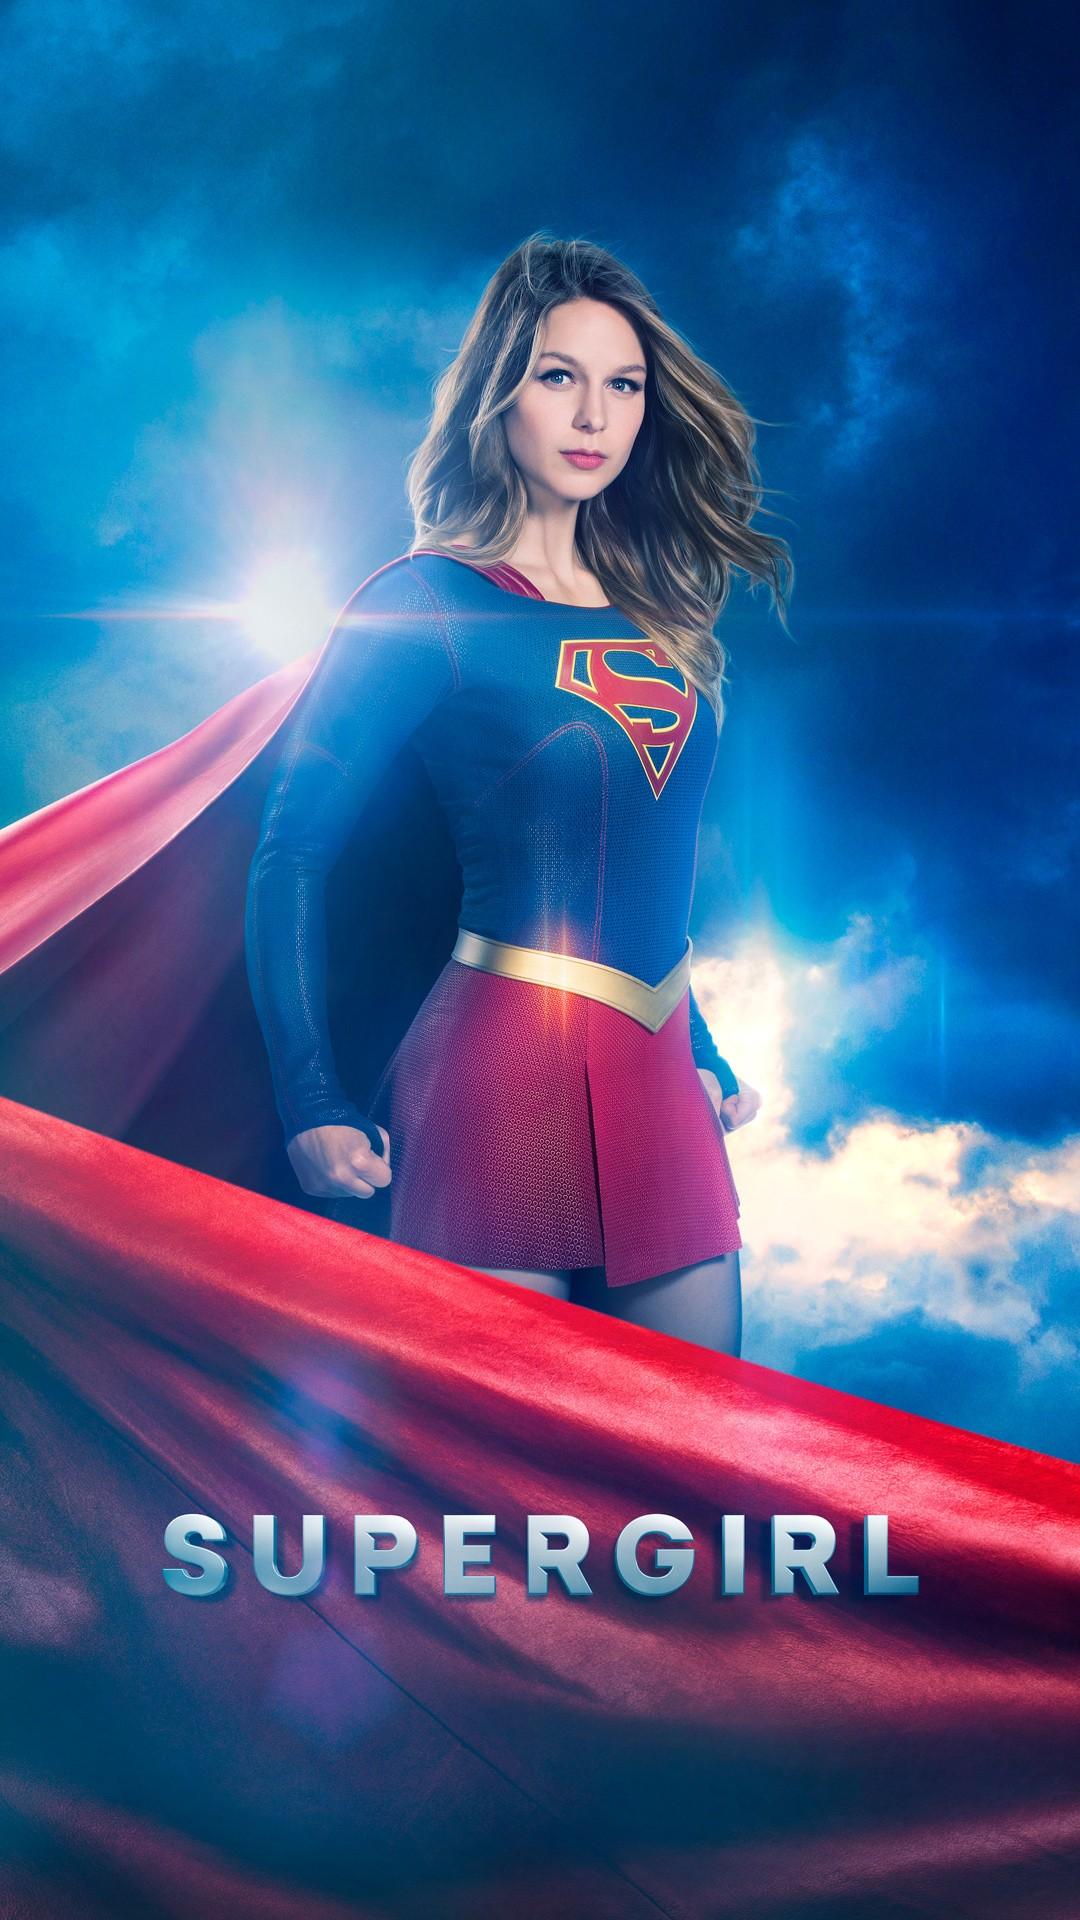 Iphone X Wallpaper Super Retina Supergirl Season 2 Wallpapers Hd Wallpapers Id 18835